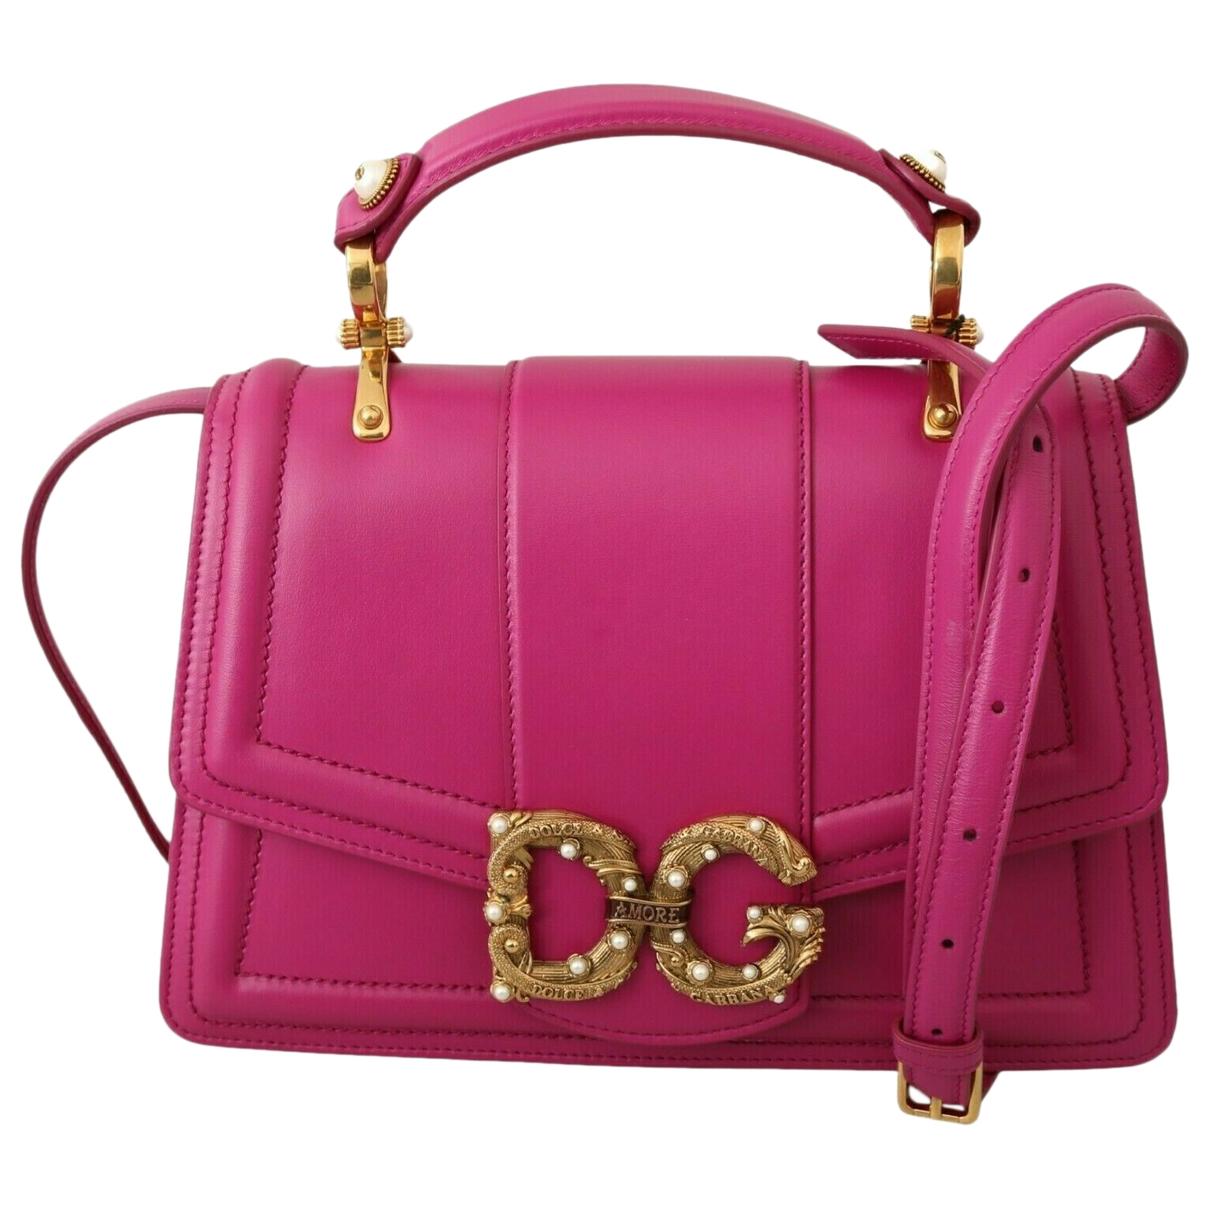 Dolce & Gabbana DG Amore Pink Leather Handbag for Women